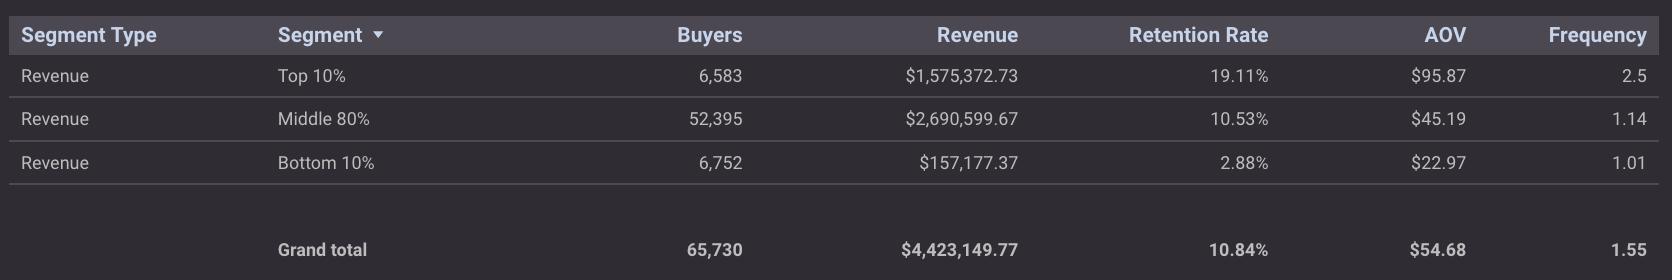 buyer segmentation by revenue